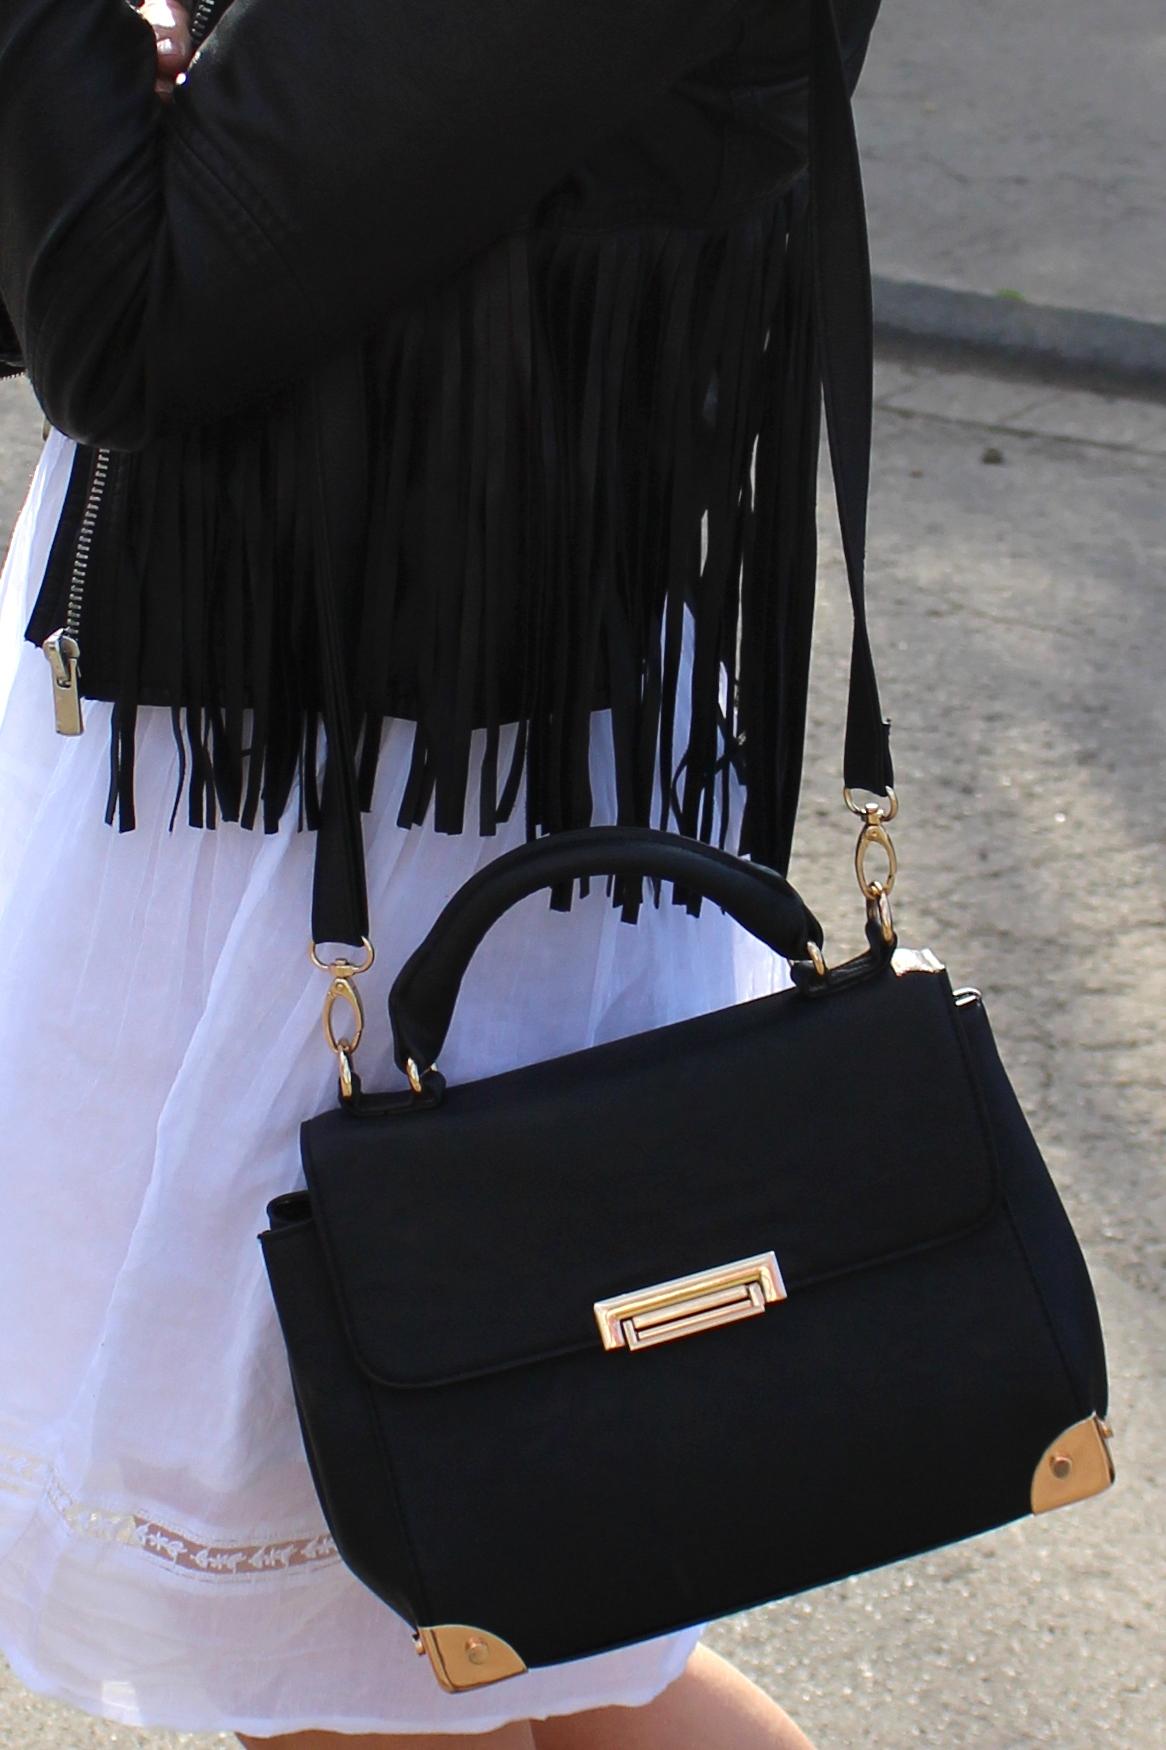 Fashioncircuz by Jenny img_5474 ROCKIG IM SPITZENKLEIDCHEN - STILBRUCH DELUXE